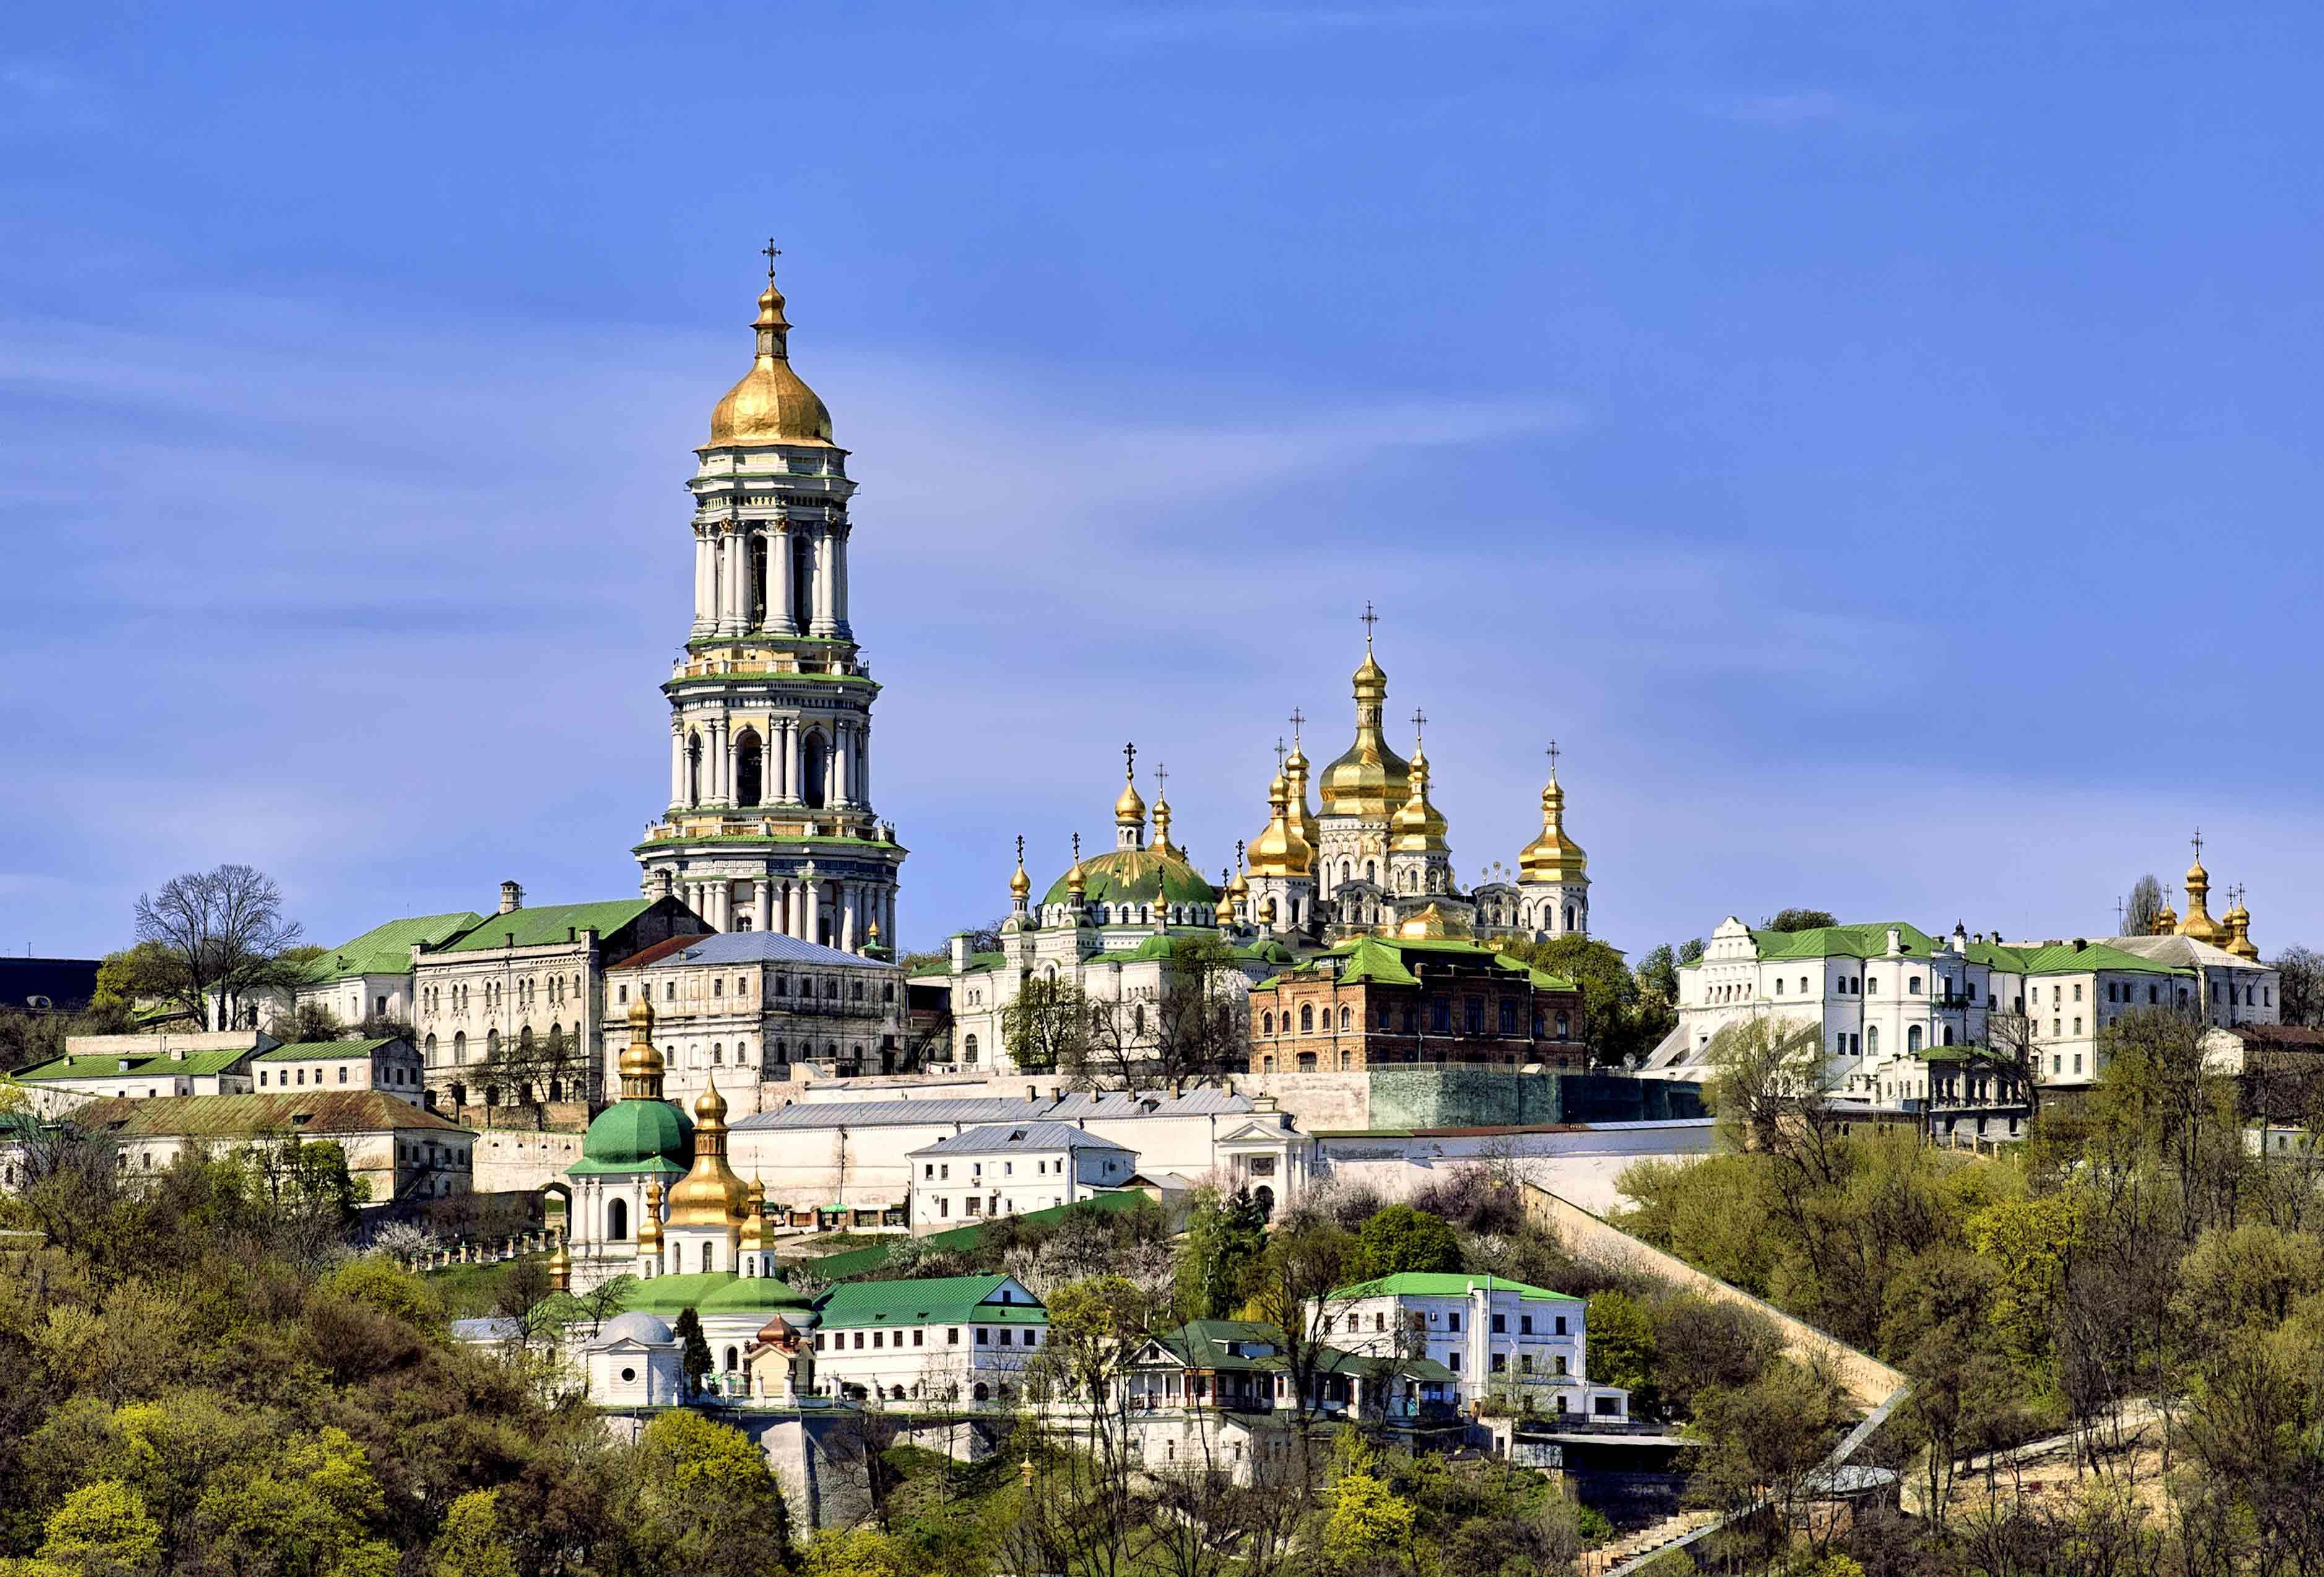 The Kiev-Pechersk Lavra